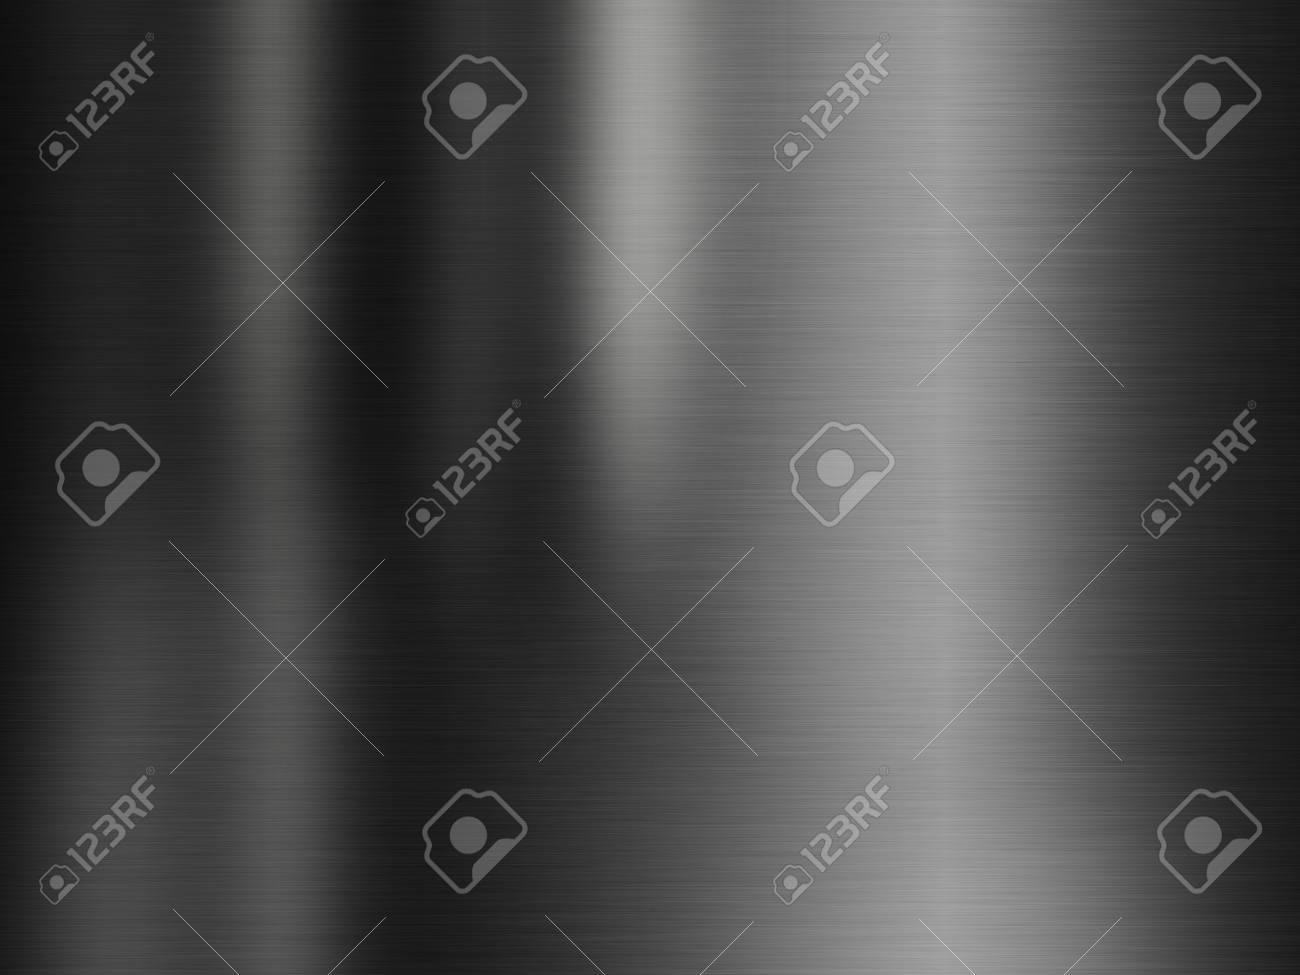 texture en acier inoxydable ou en métal texture de fond Banque d'images - 75076758